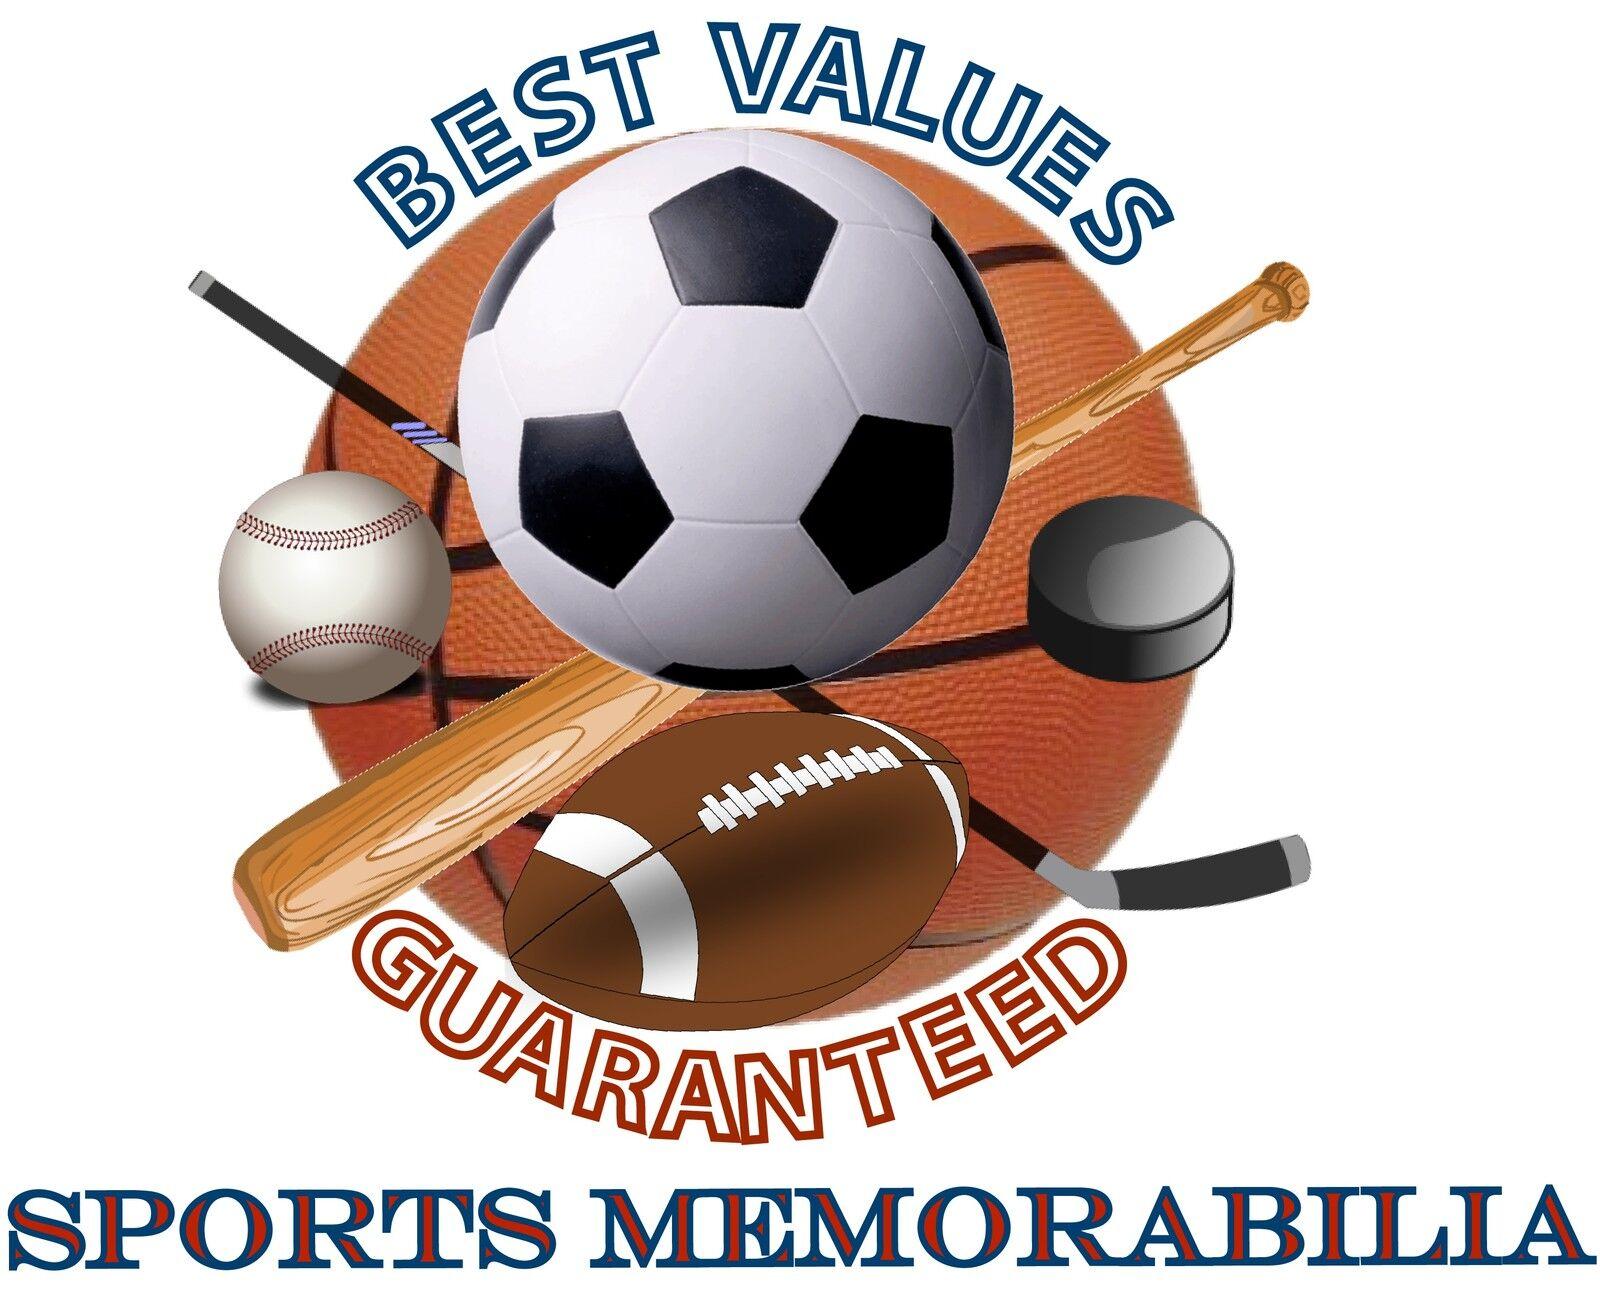 Best Values Guaranteed